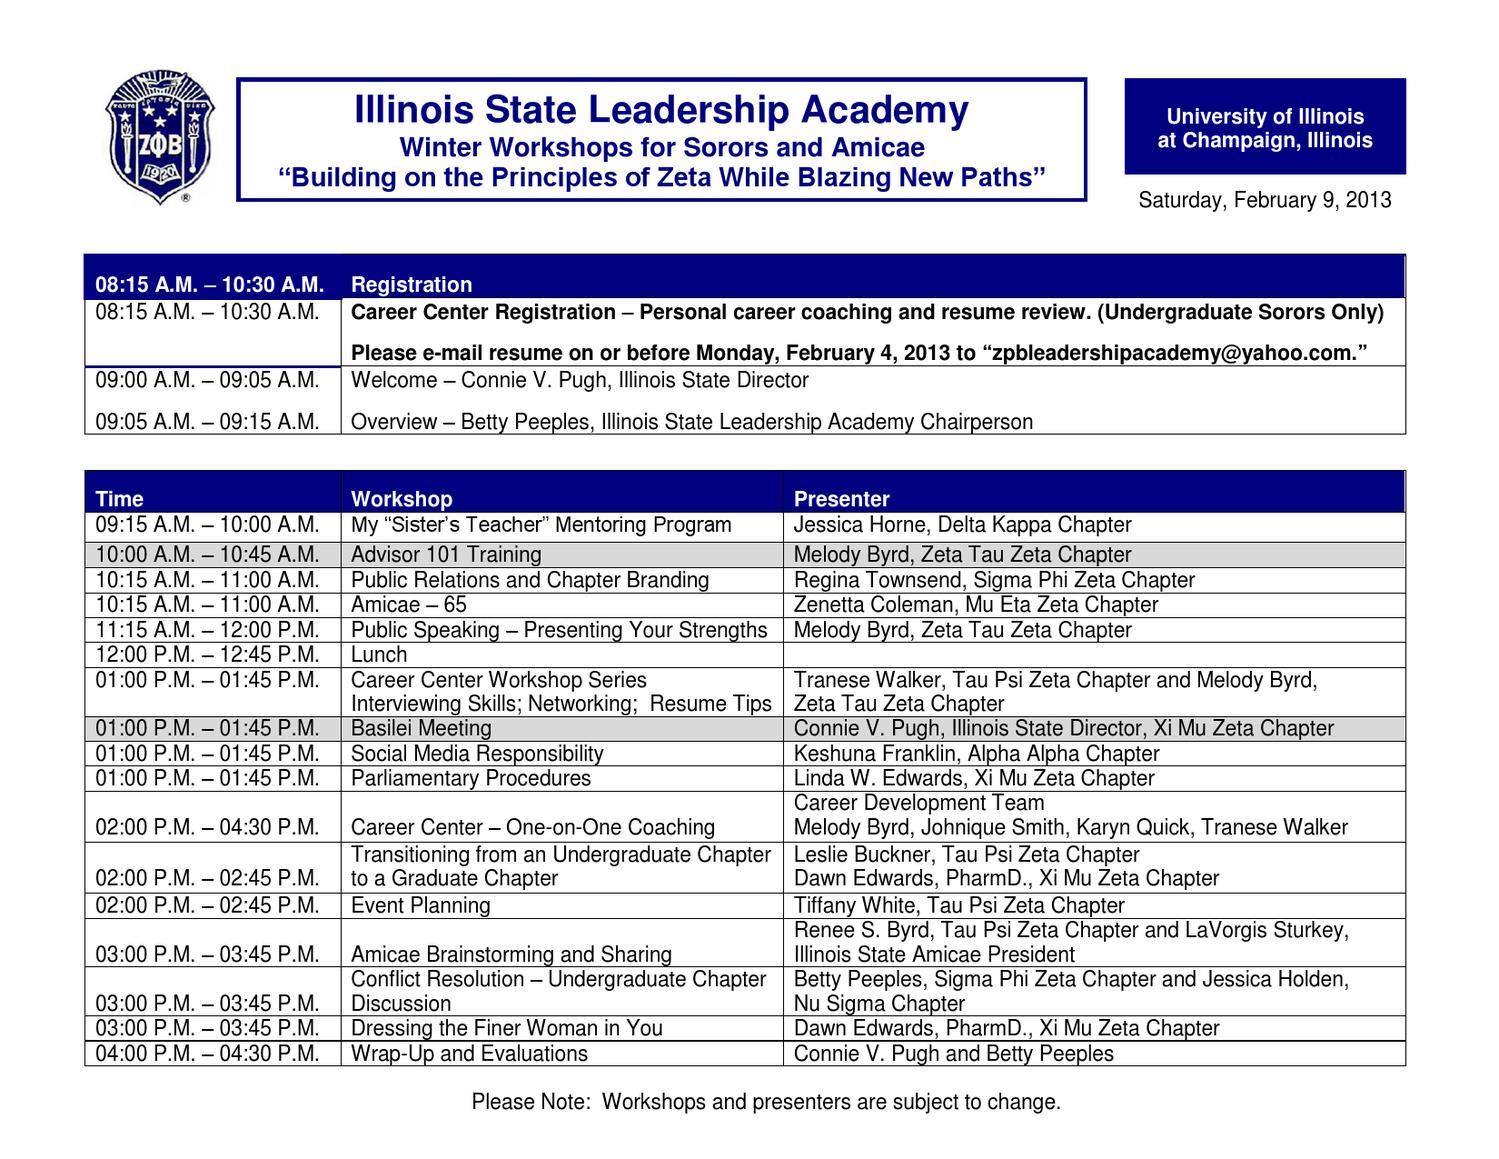 illinois state leadership academy workshops 2013 by zeta